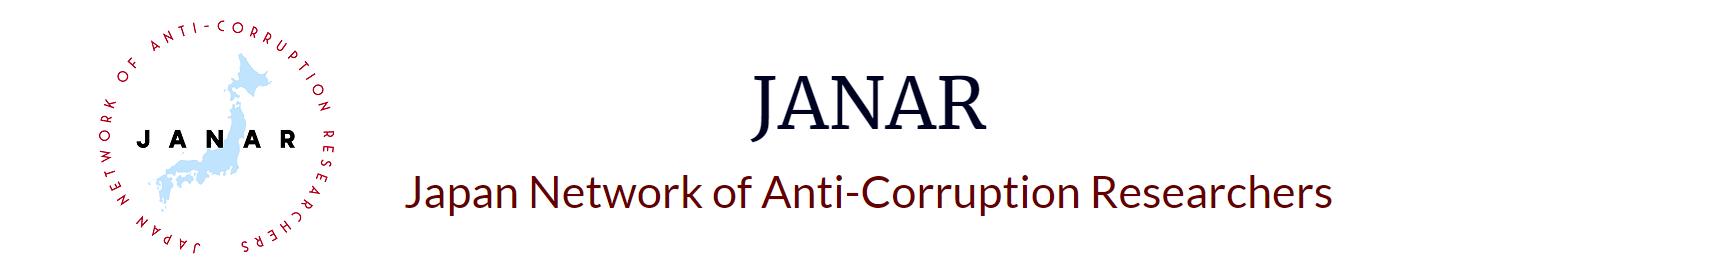 JANAR